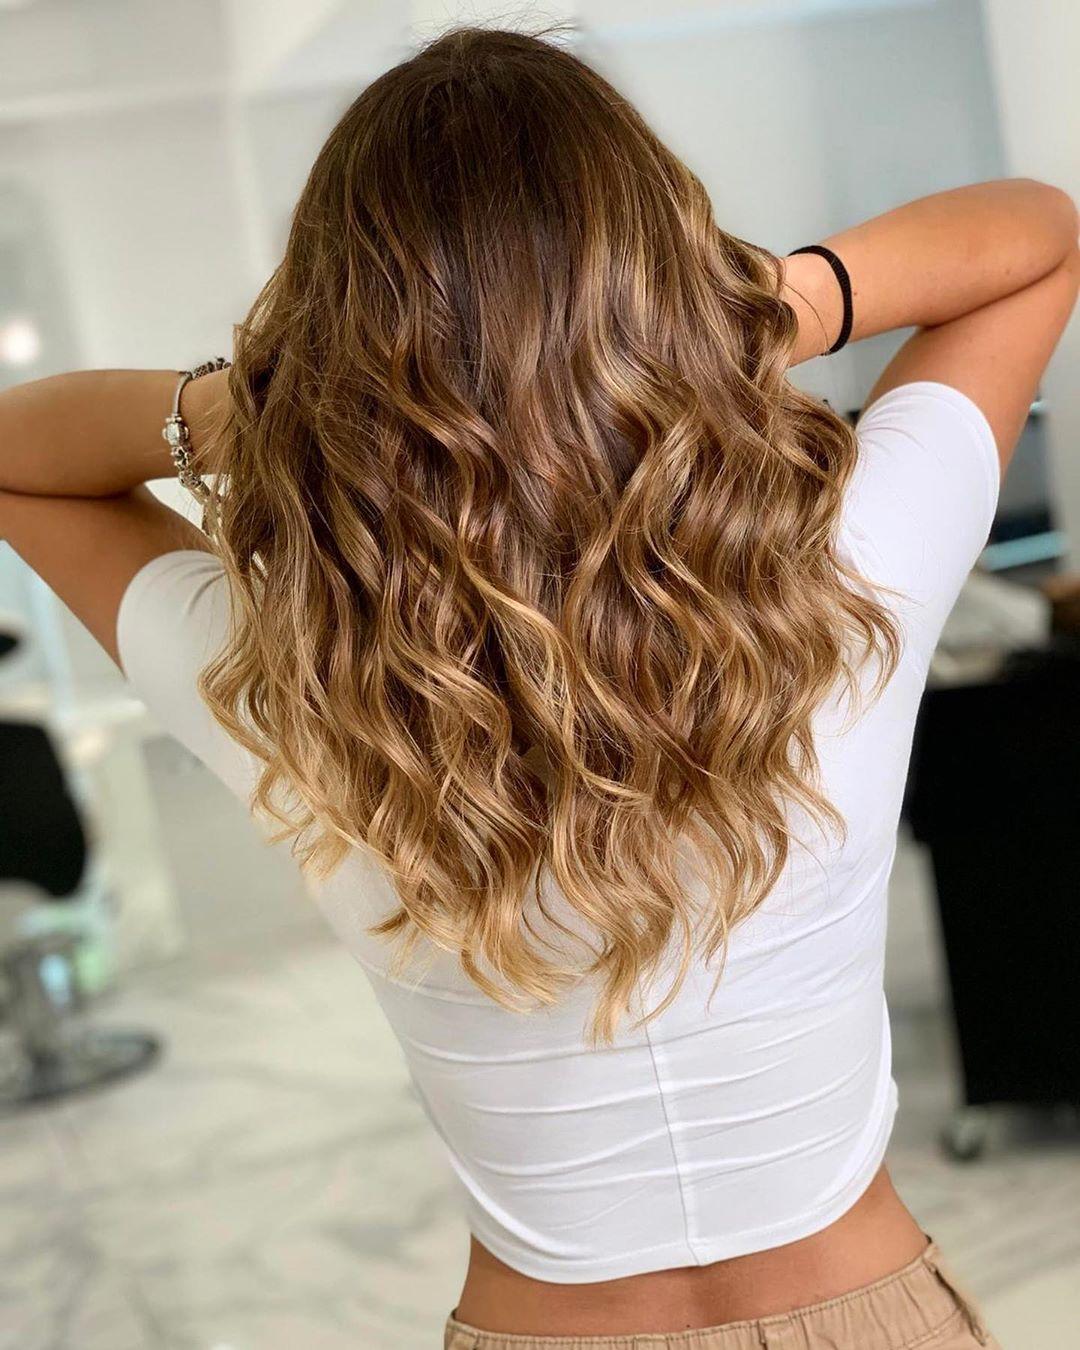 dyesign-salon-hairstyle-hair-style-salonni-roma